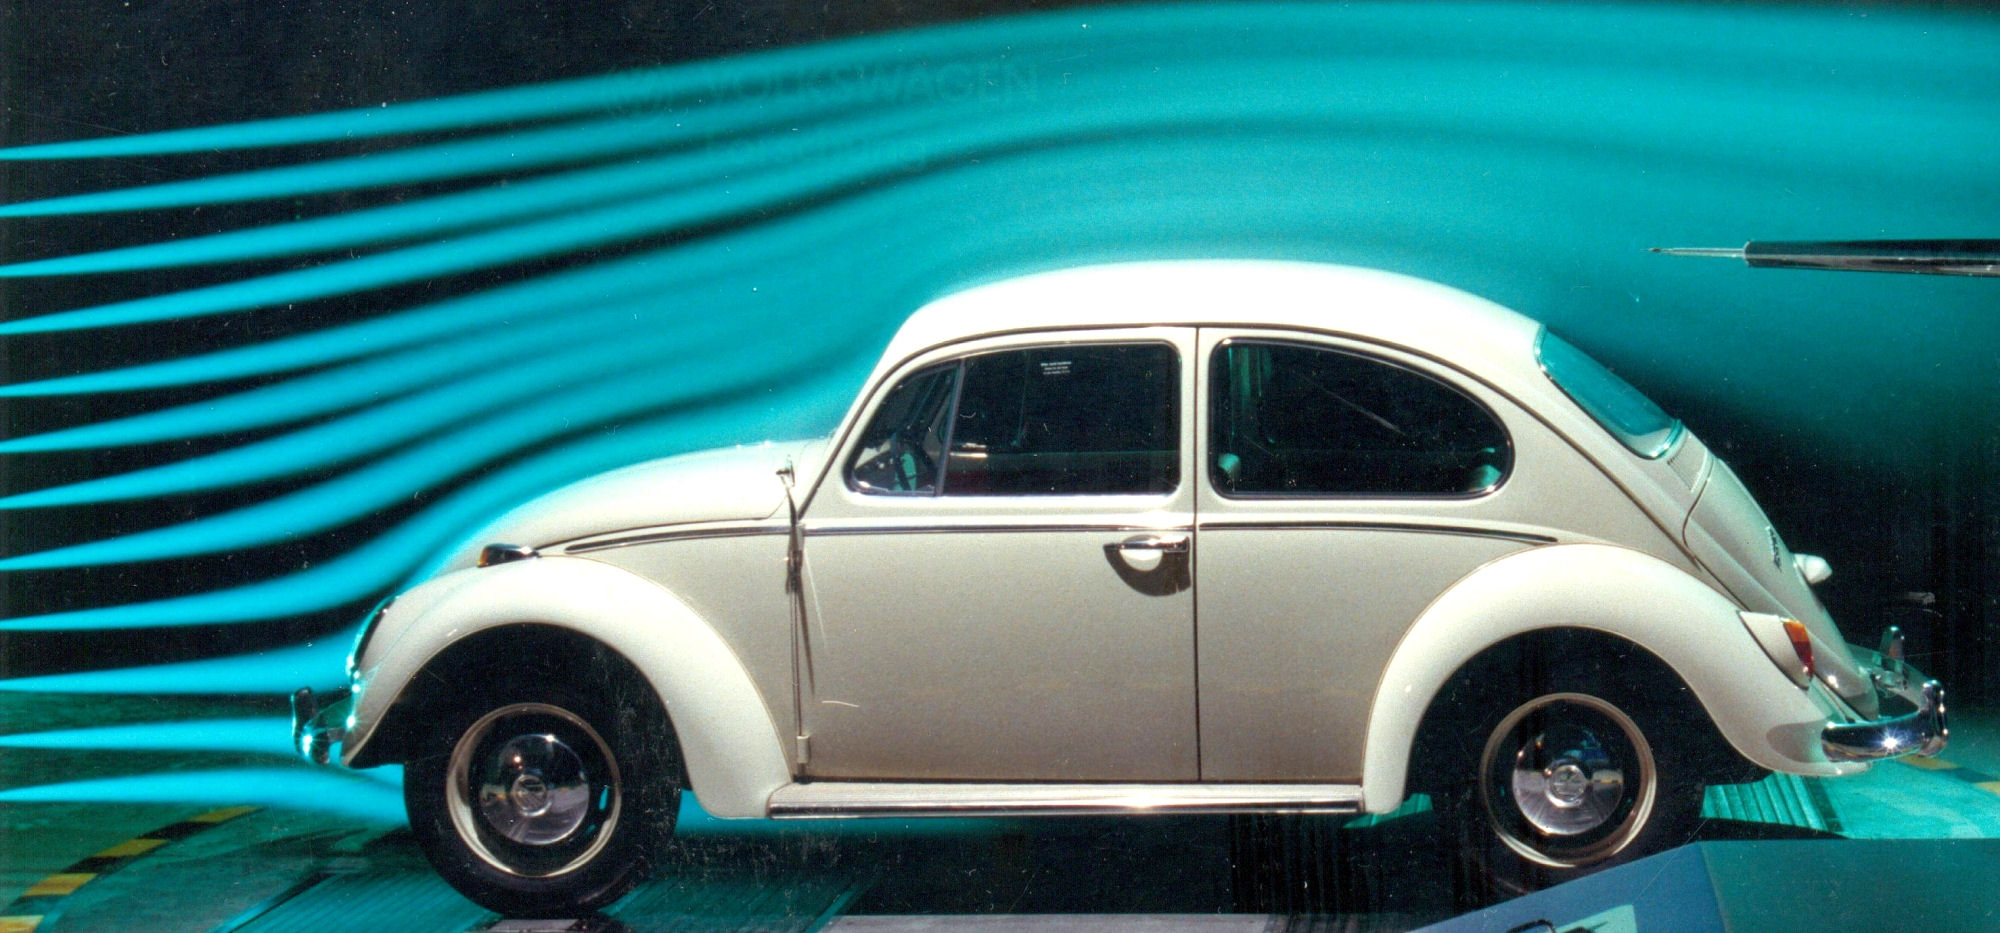 beetle aerodynamics roofspoiler. Black Bedroom Furniture Sets. Home Design Ideas